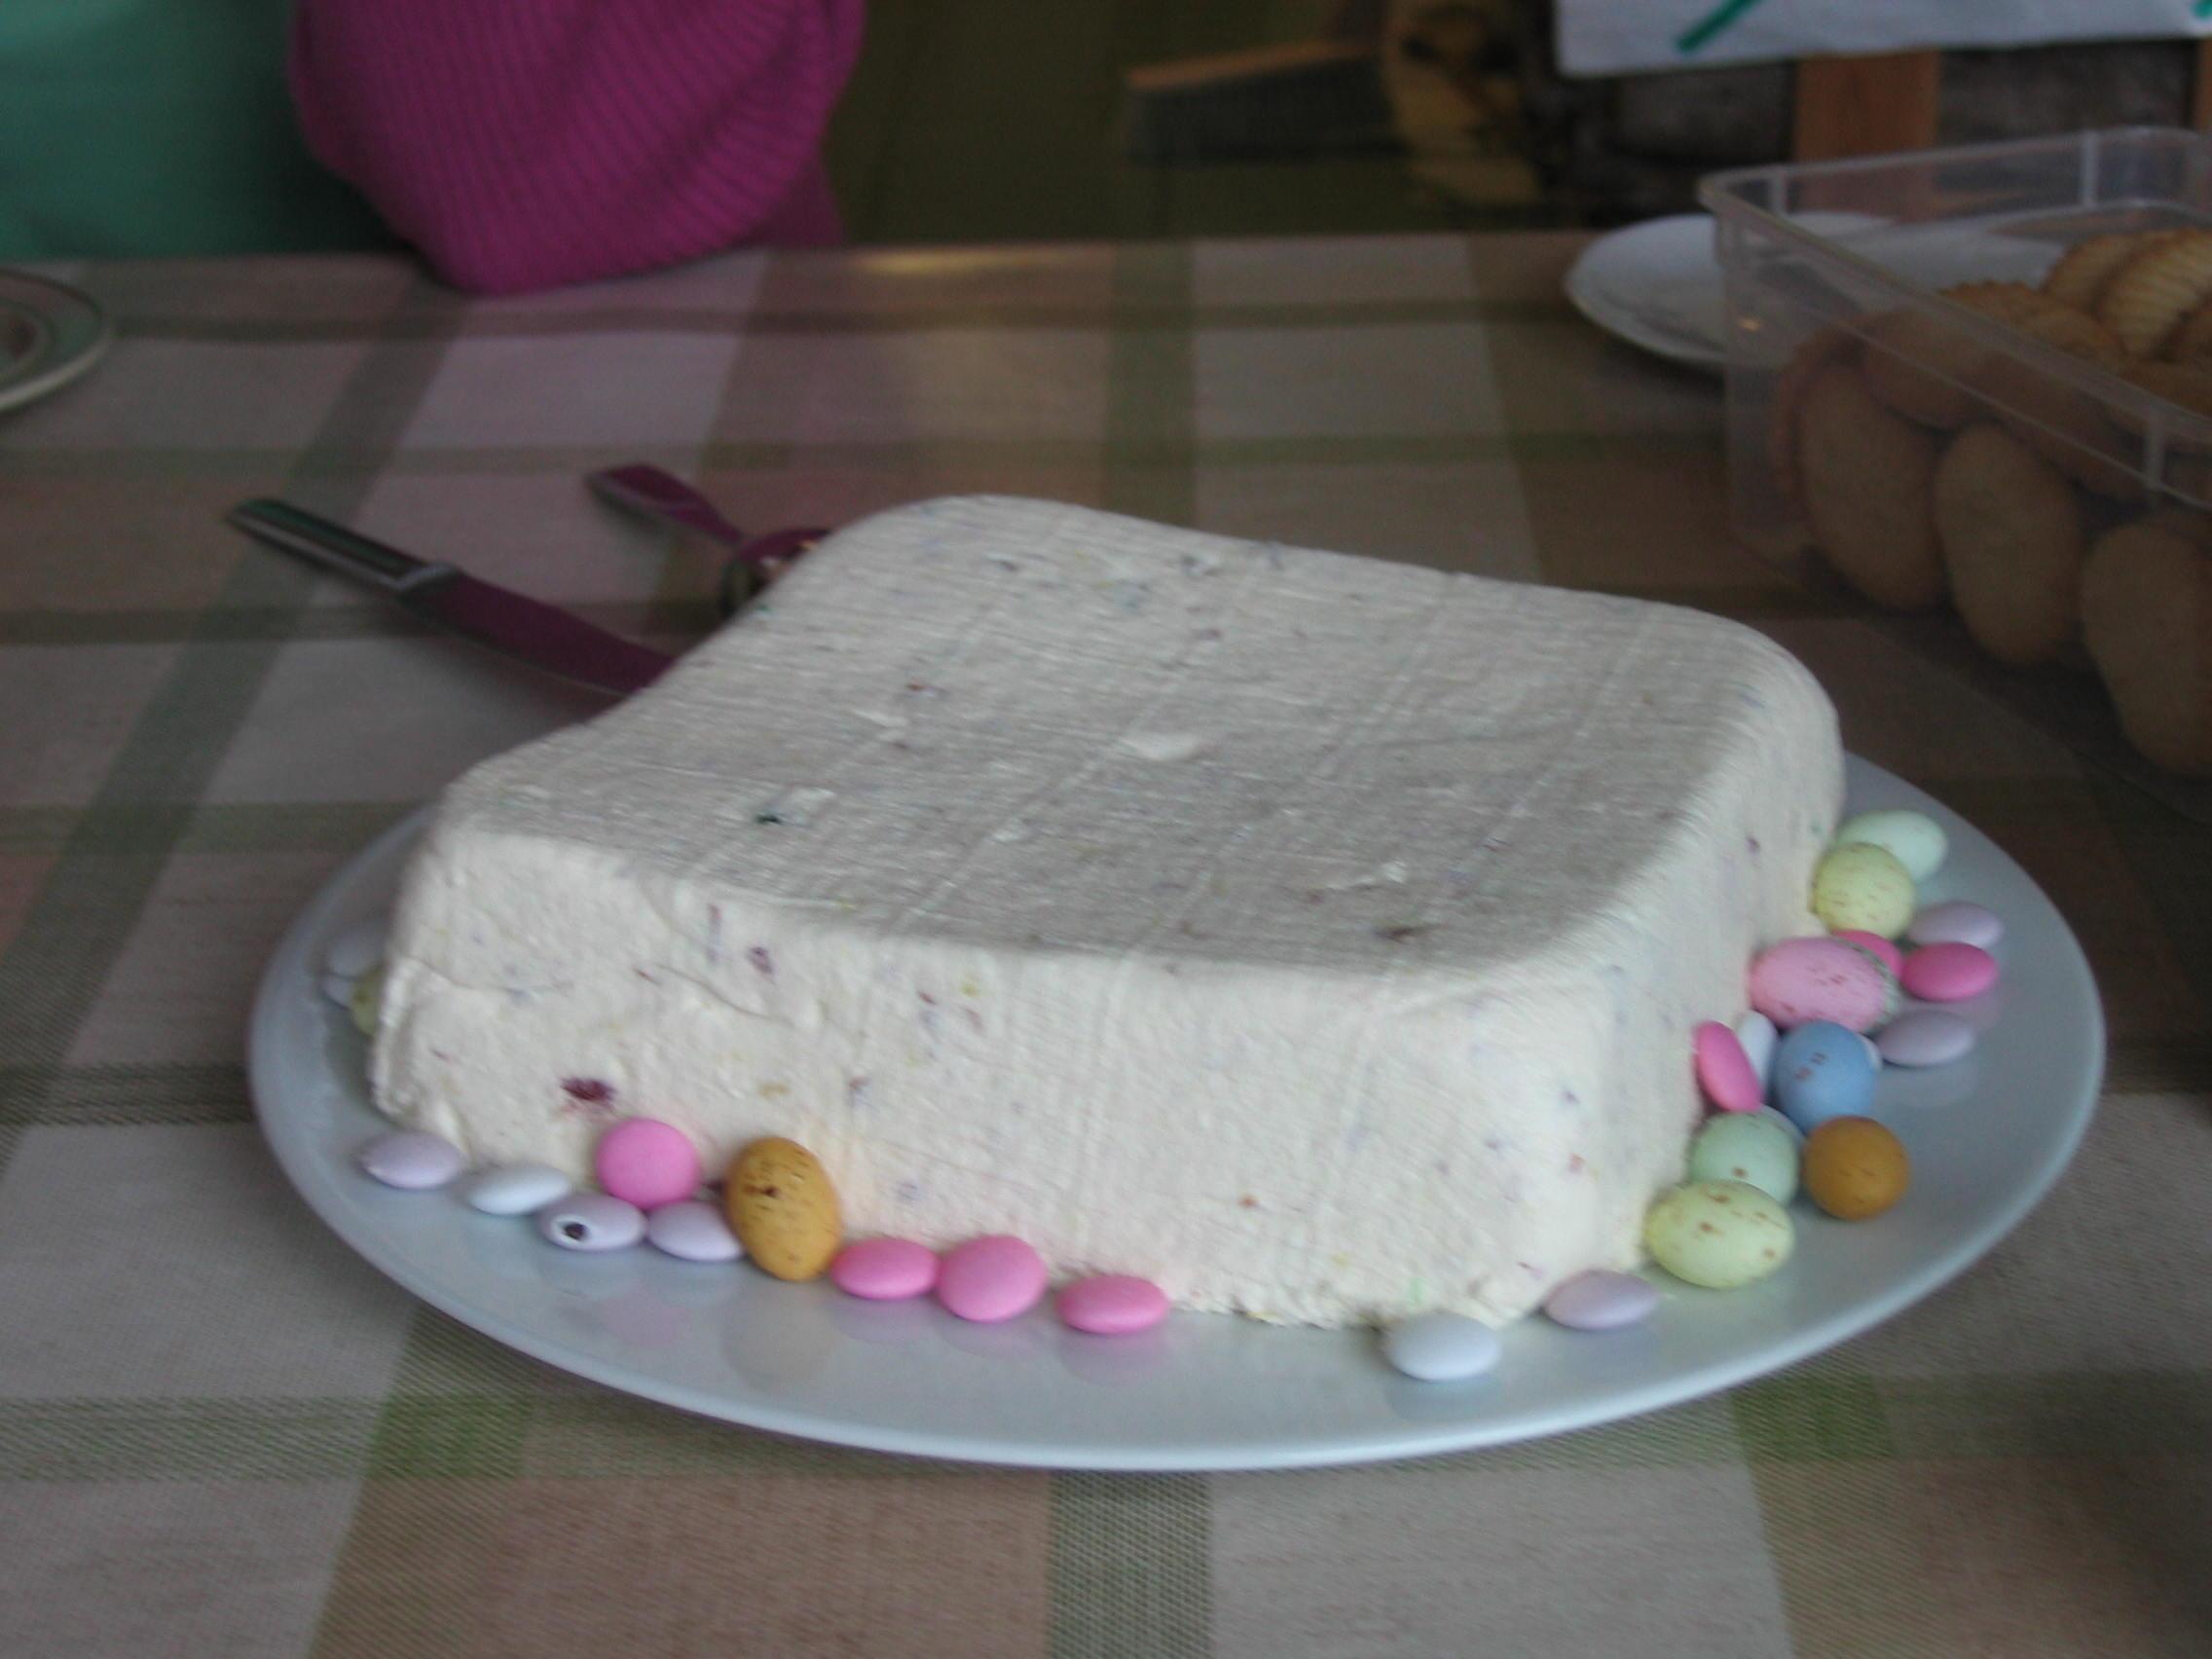 Extreme Cake Makers Uk Camberwell